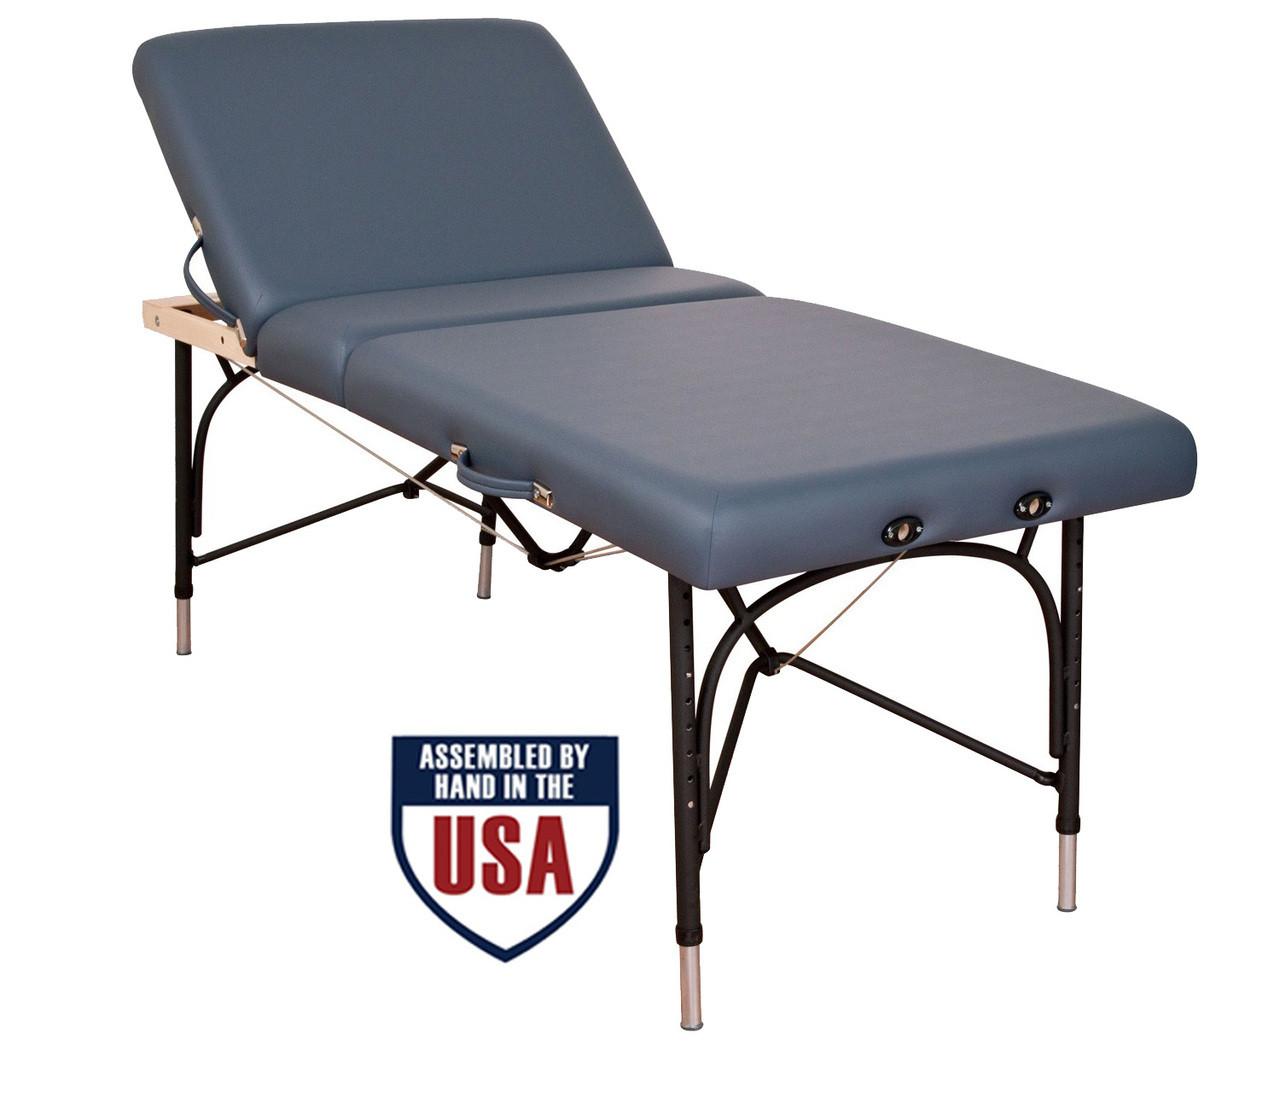 oakworks alliance aluminum massage table massage world rh massageworld com oakworks massage table nova oakworks massage table kela